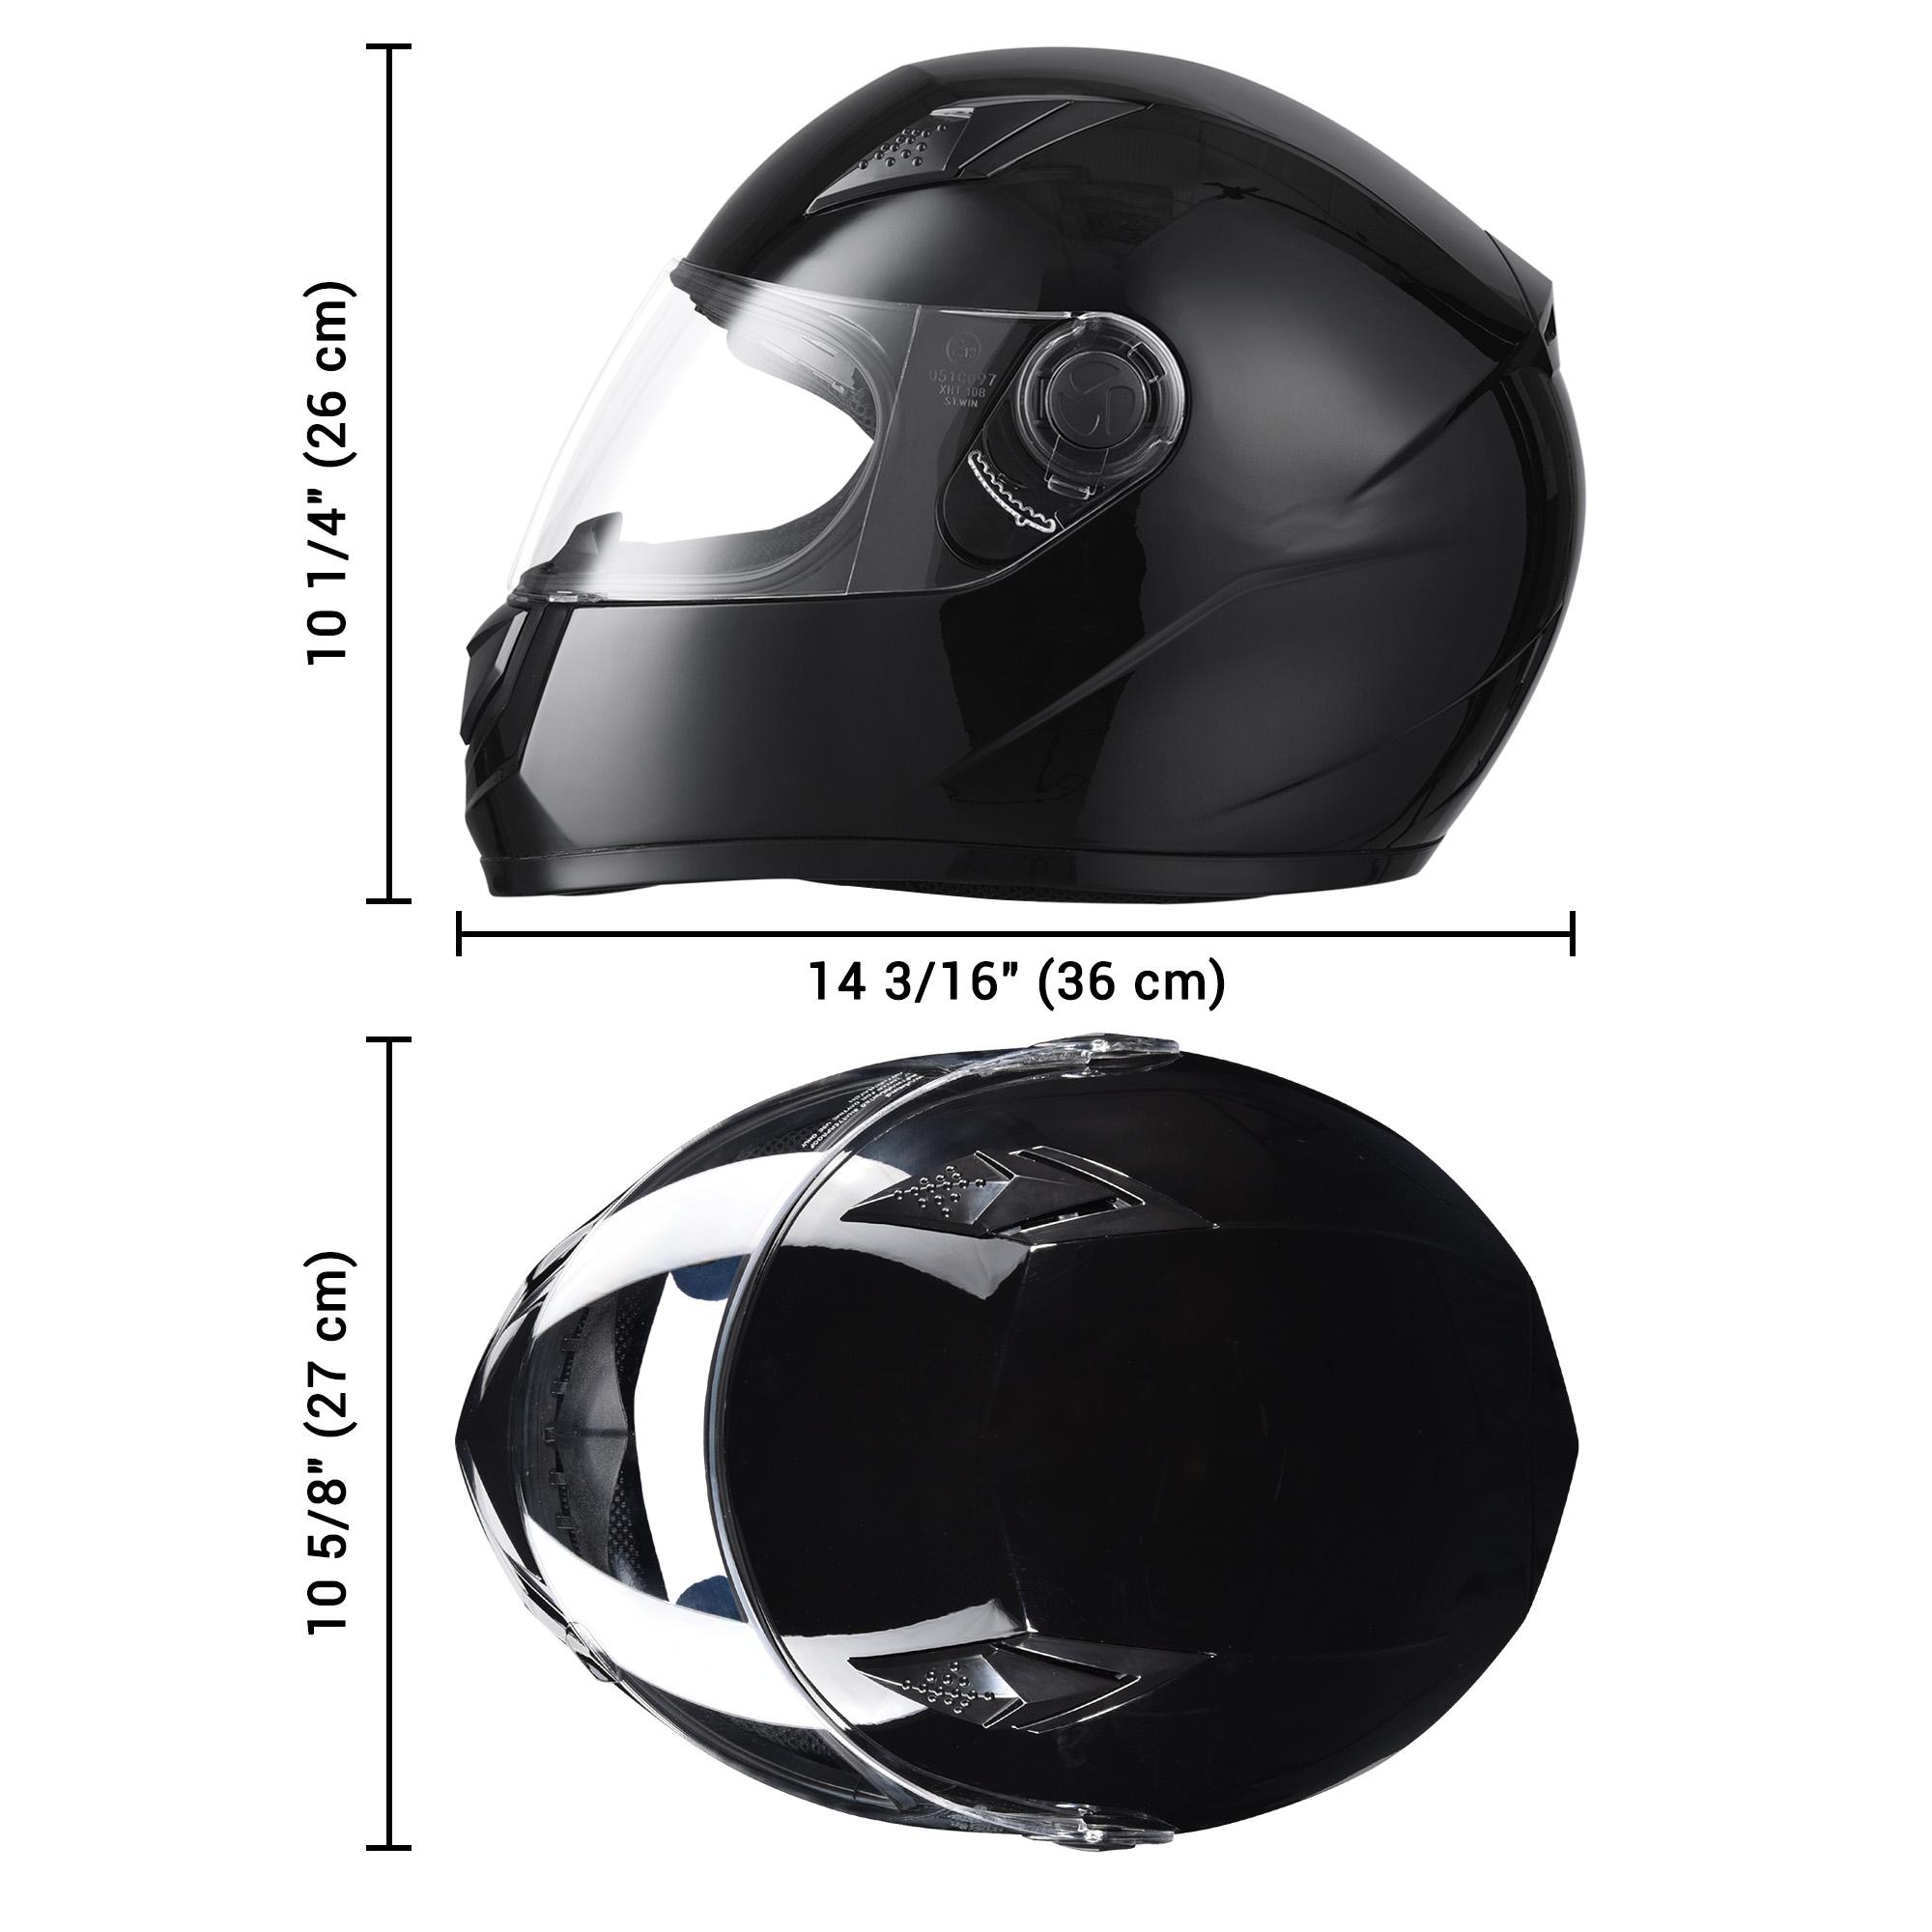 miniature 58 - AHR K12 Full Face Motorcycle Helmet DOT Air Vents Clear Visor Racing S M L XL